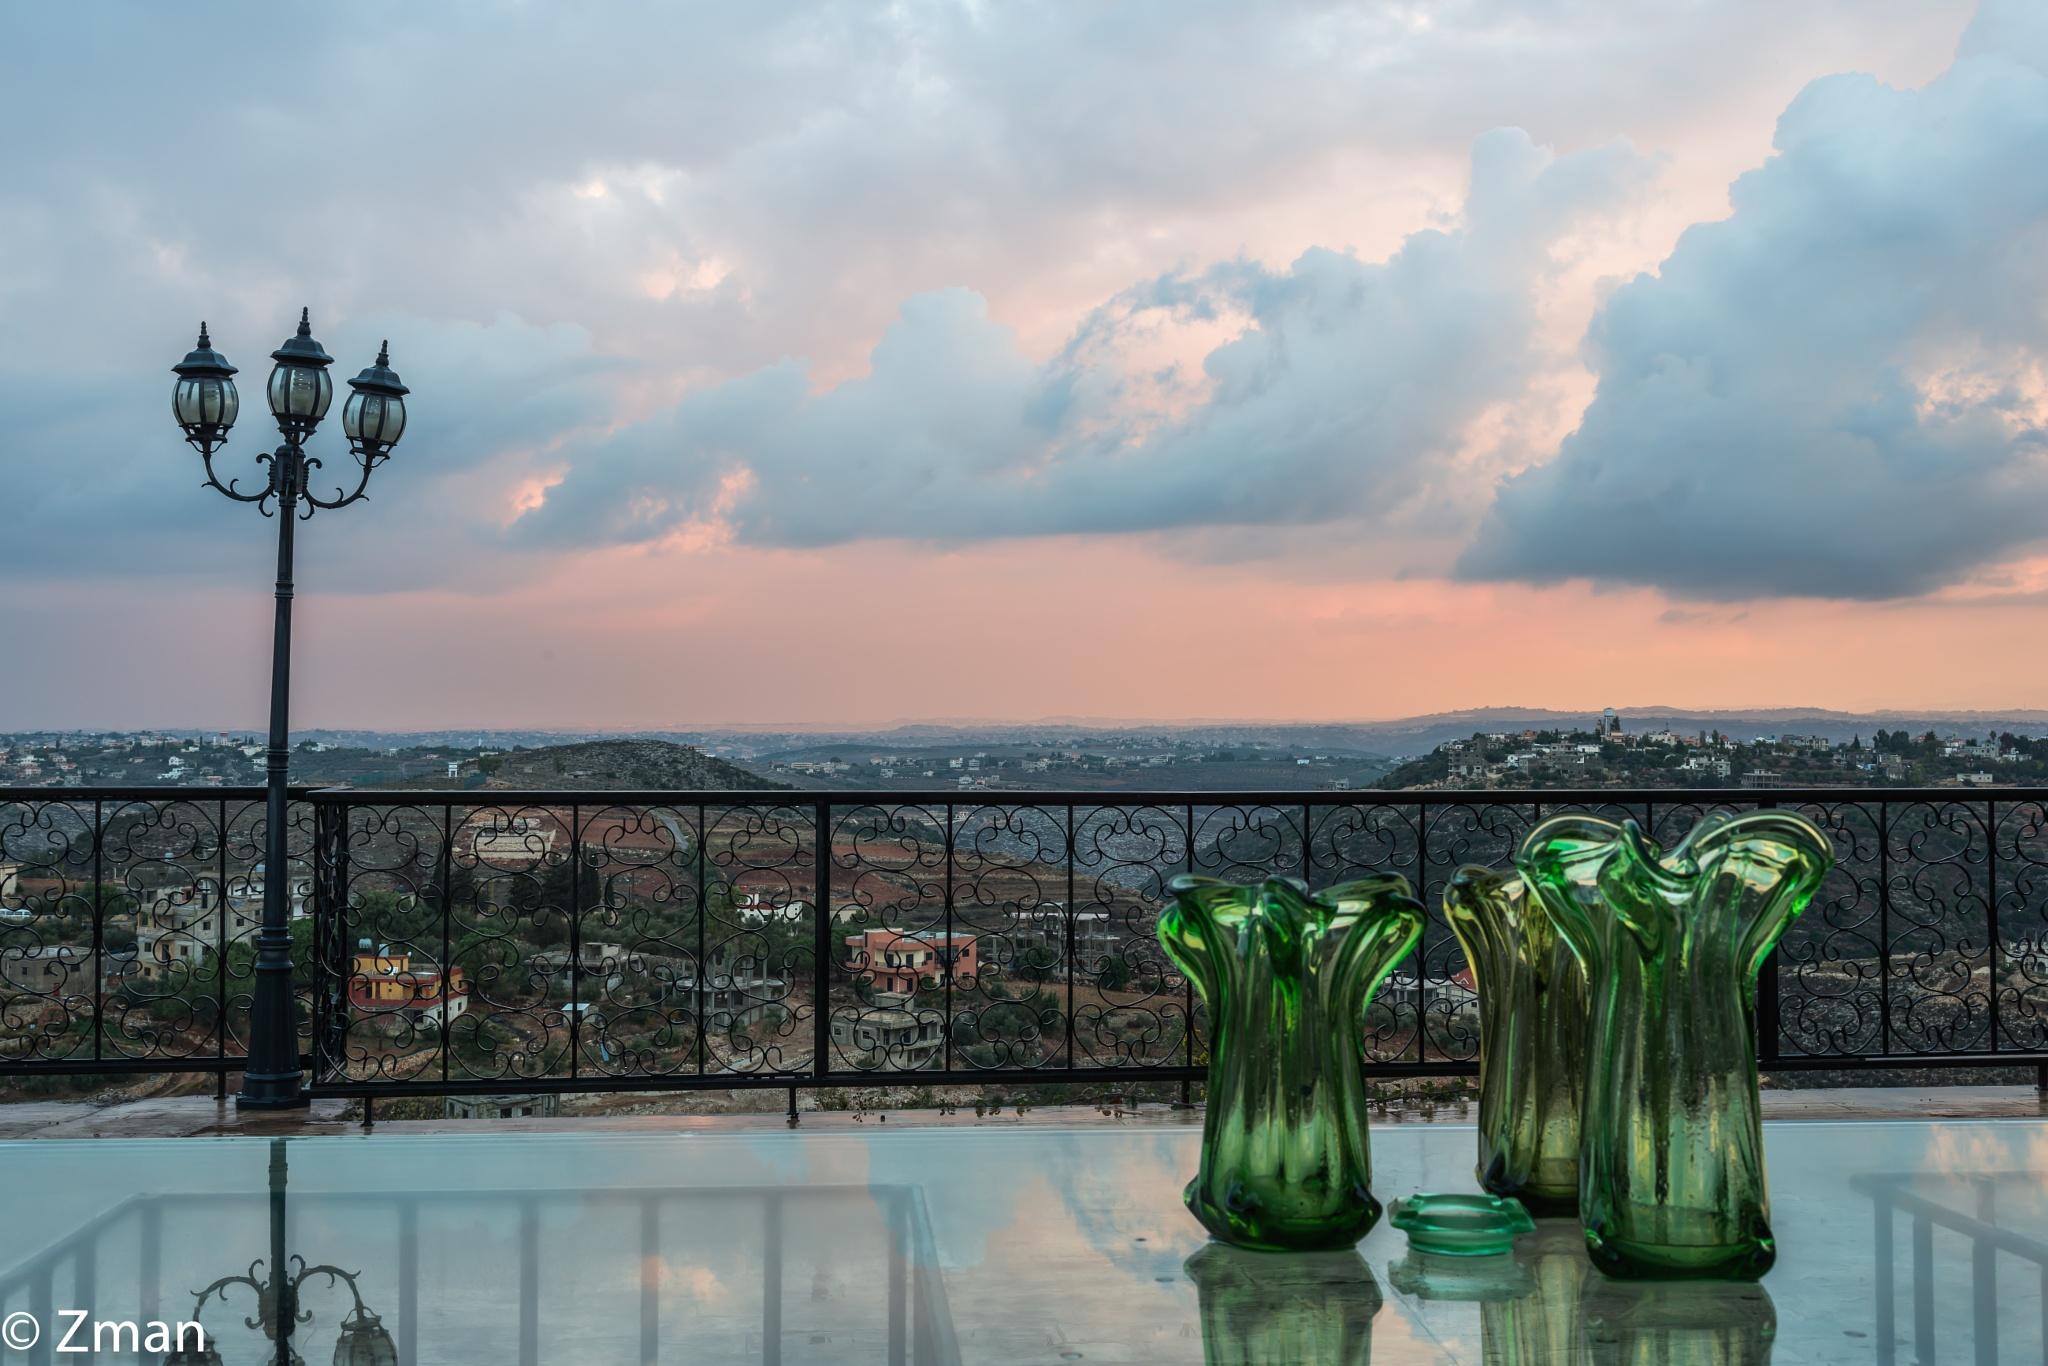 Three Vases by muhammad.nasser.963